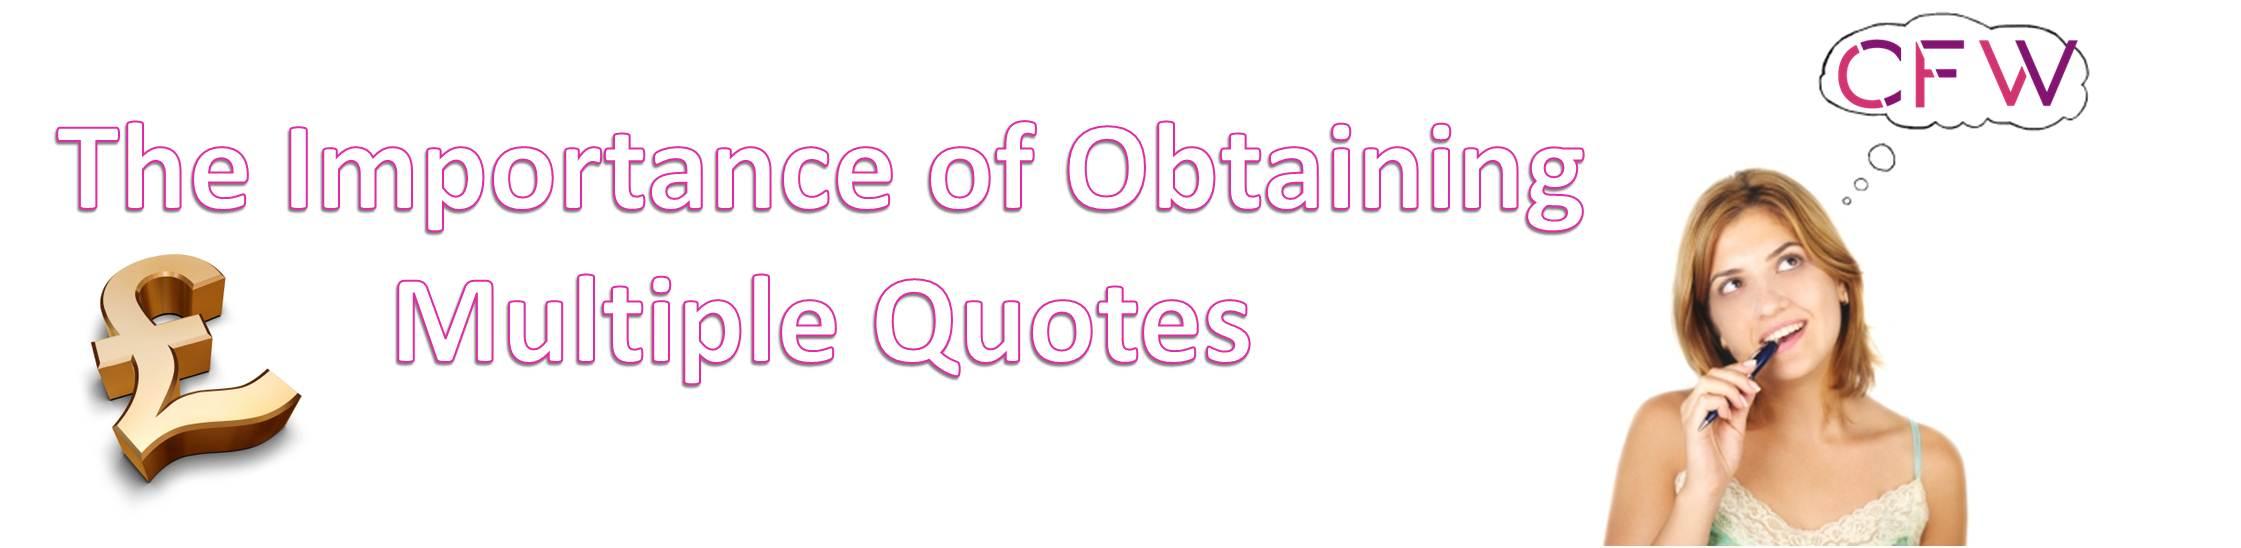 Multiple quote #5